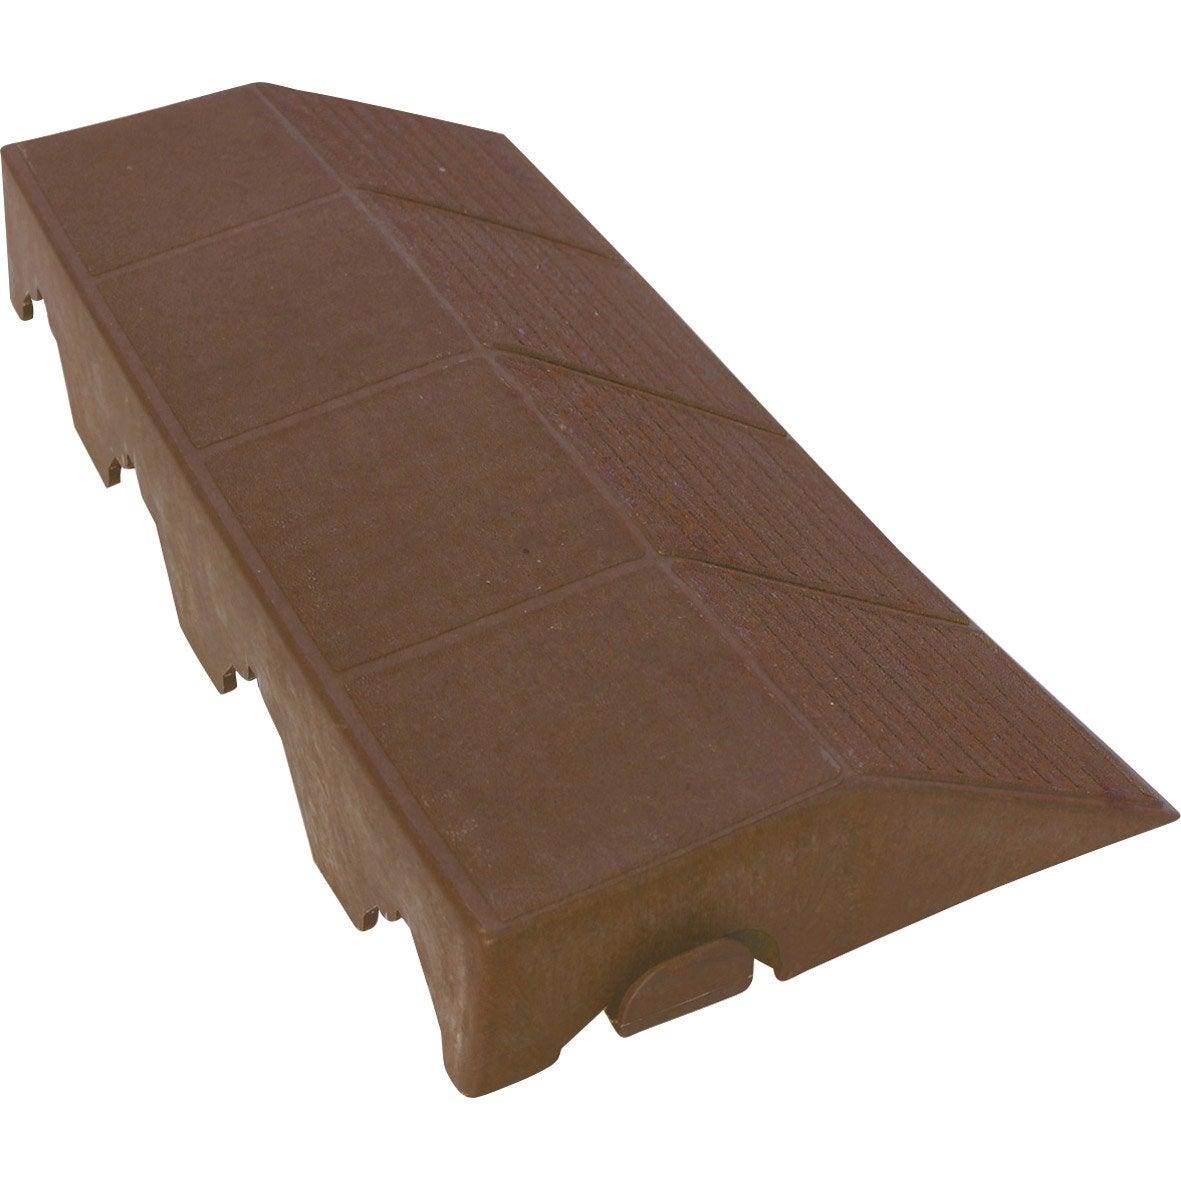 bordure de finition xtiles crossover l 0 4 x l m leroy merlin. Black Bedroom Furniture Sets. Home Design Ideas